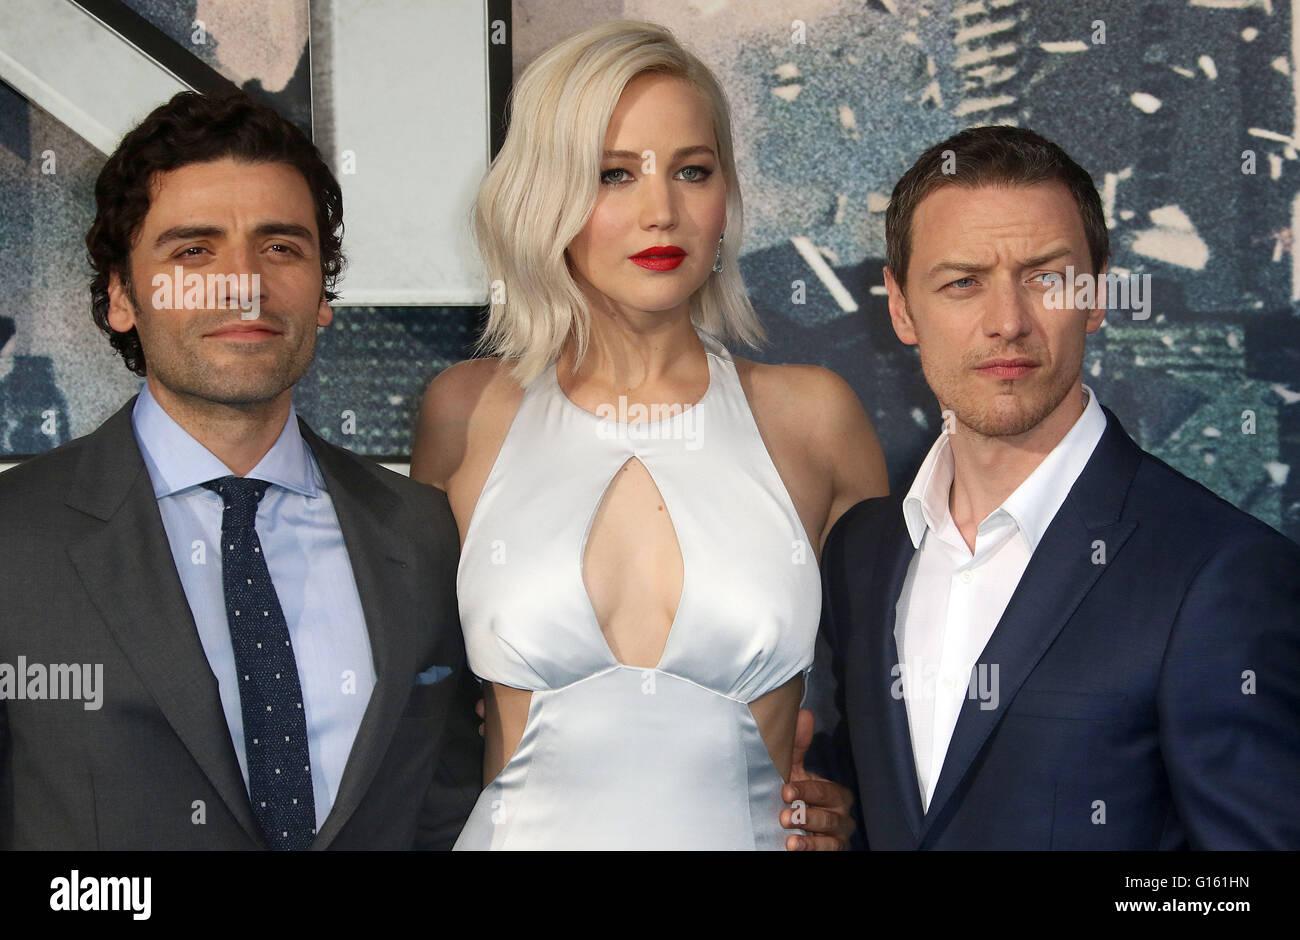 London, UK. 9th May, 2016. Oscar Isaac, Jennifer Lawrence and James McAvoy attending 'X-Men Apocalypse' - Stock Image